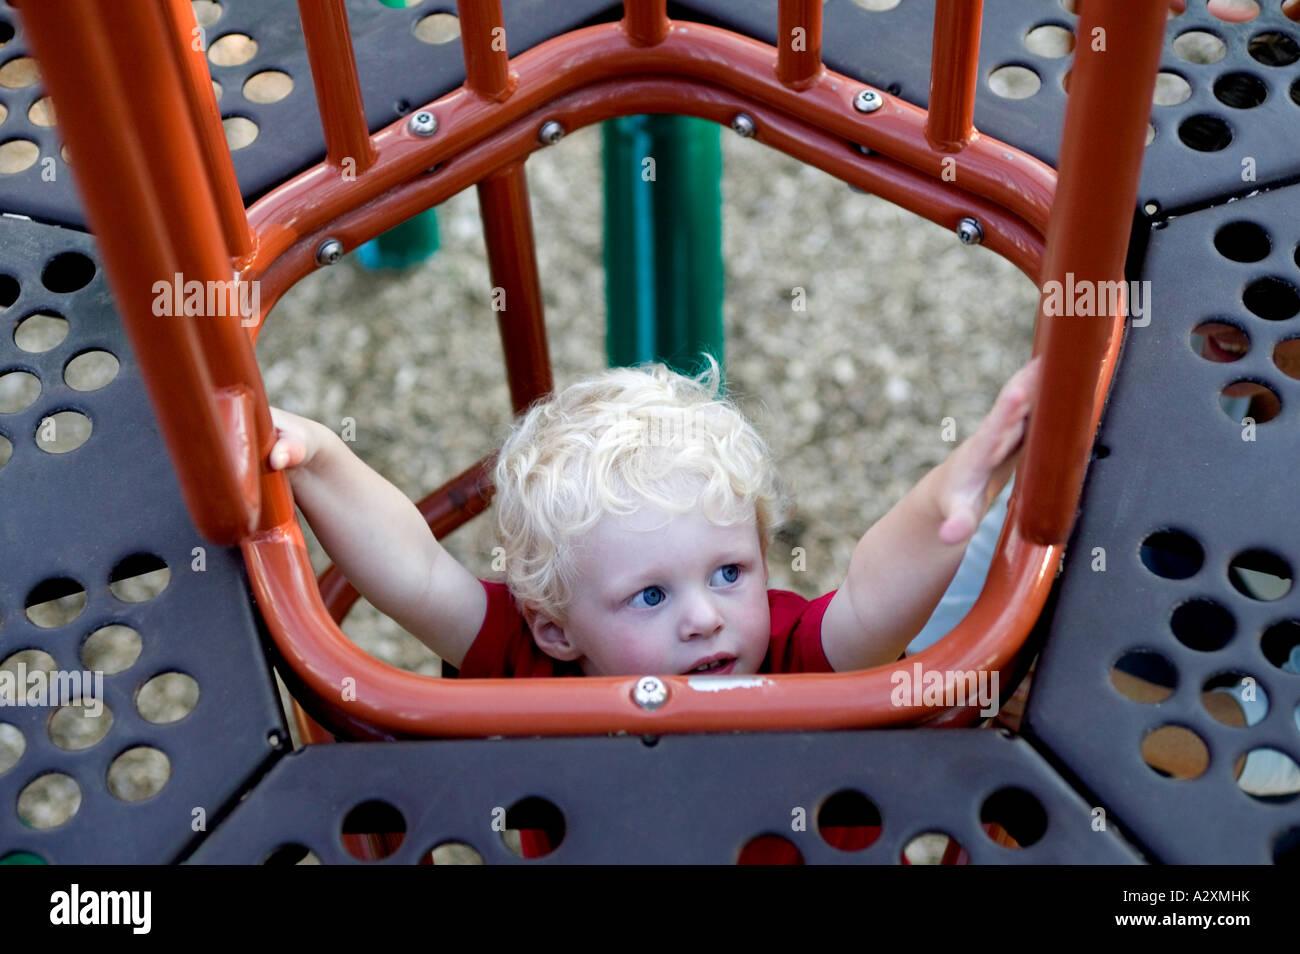 Toddler Boy Climbs Jungle Gym On Town Playground, Salida, Colorado, USA - Stock Image